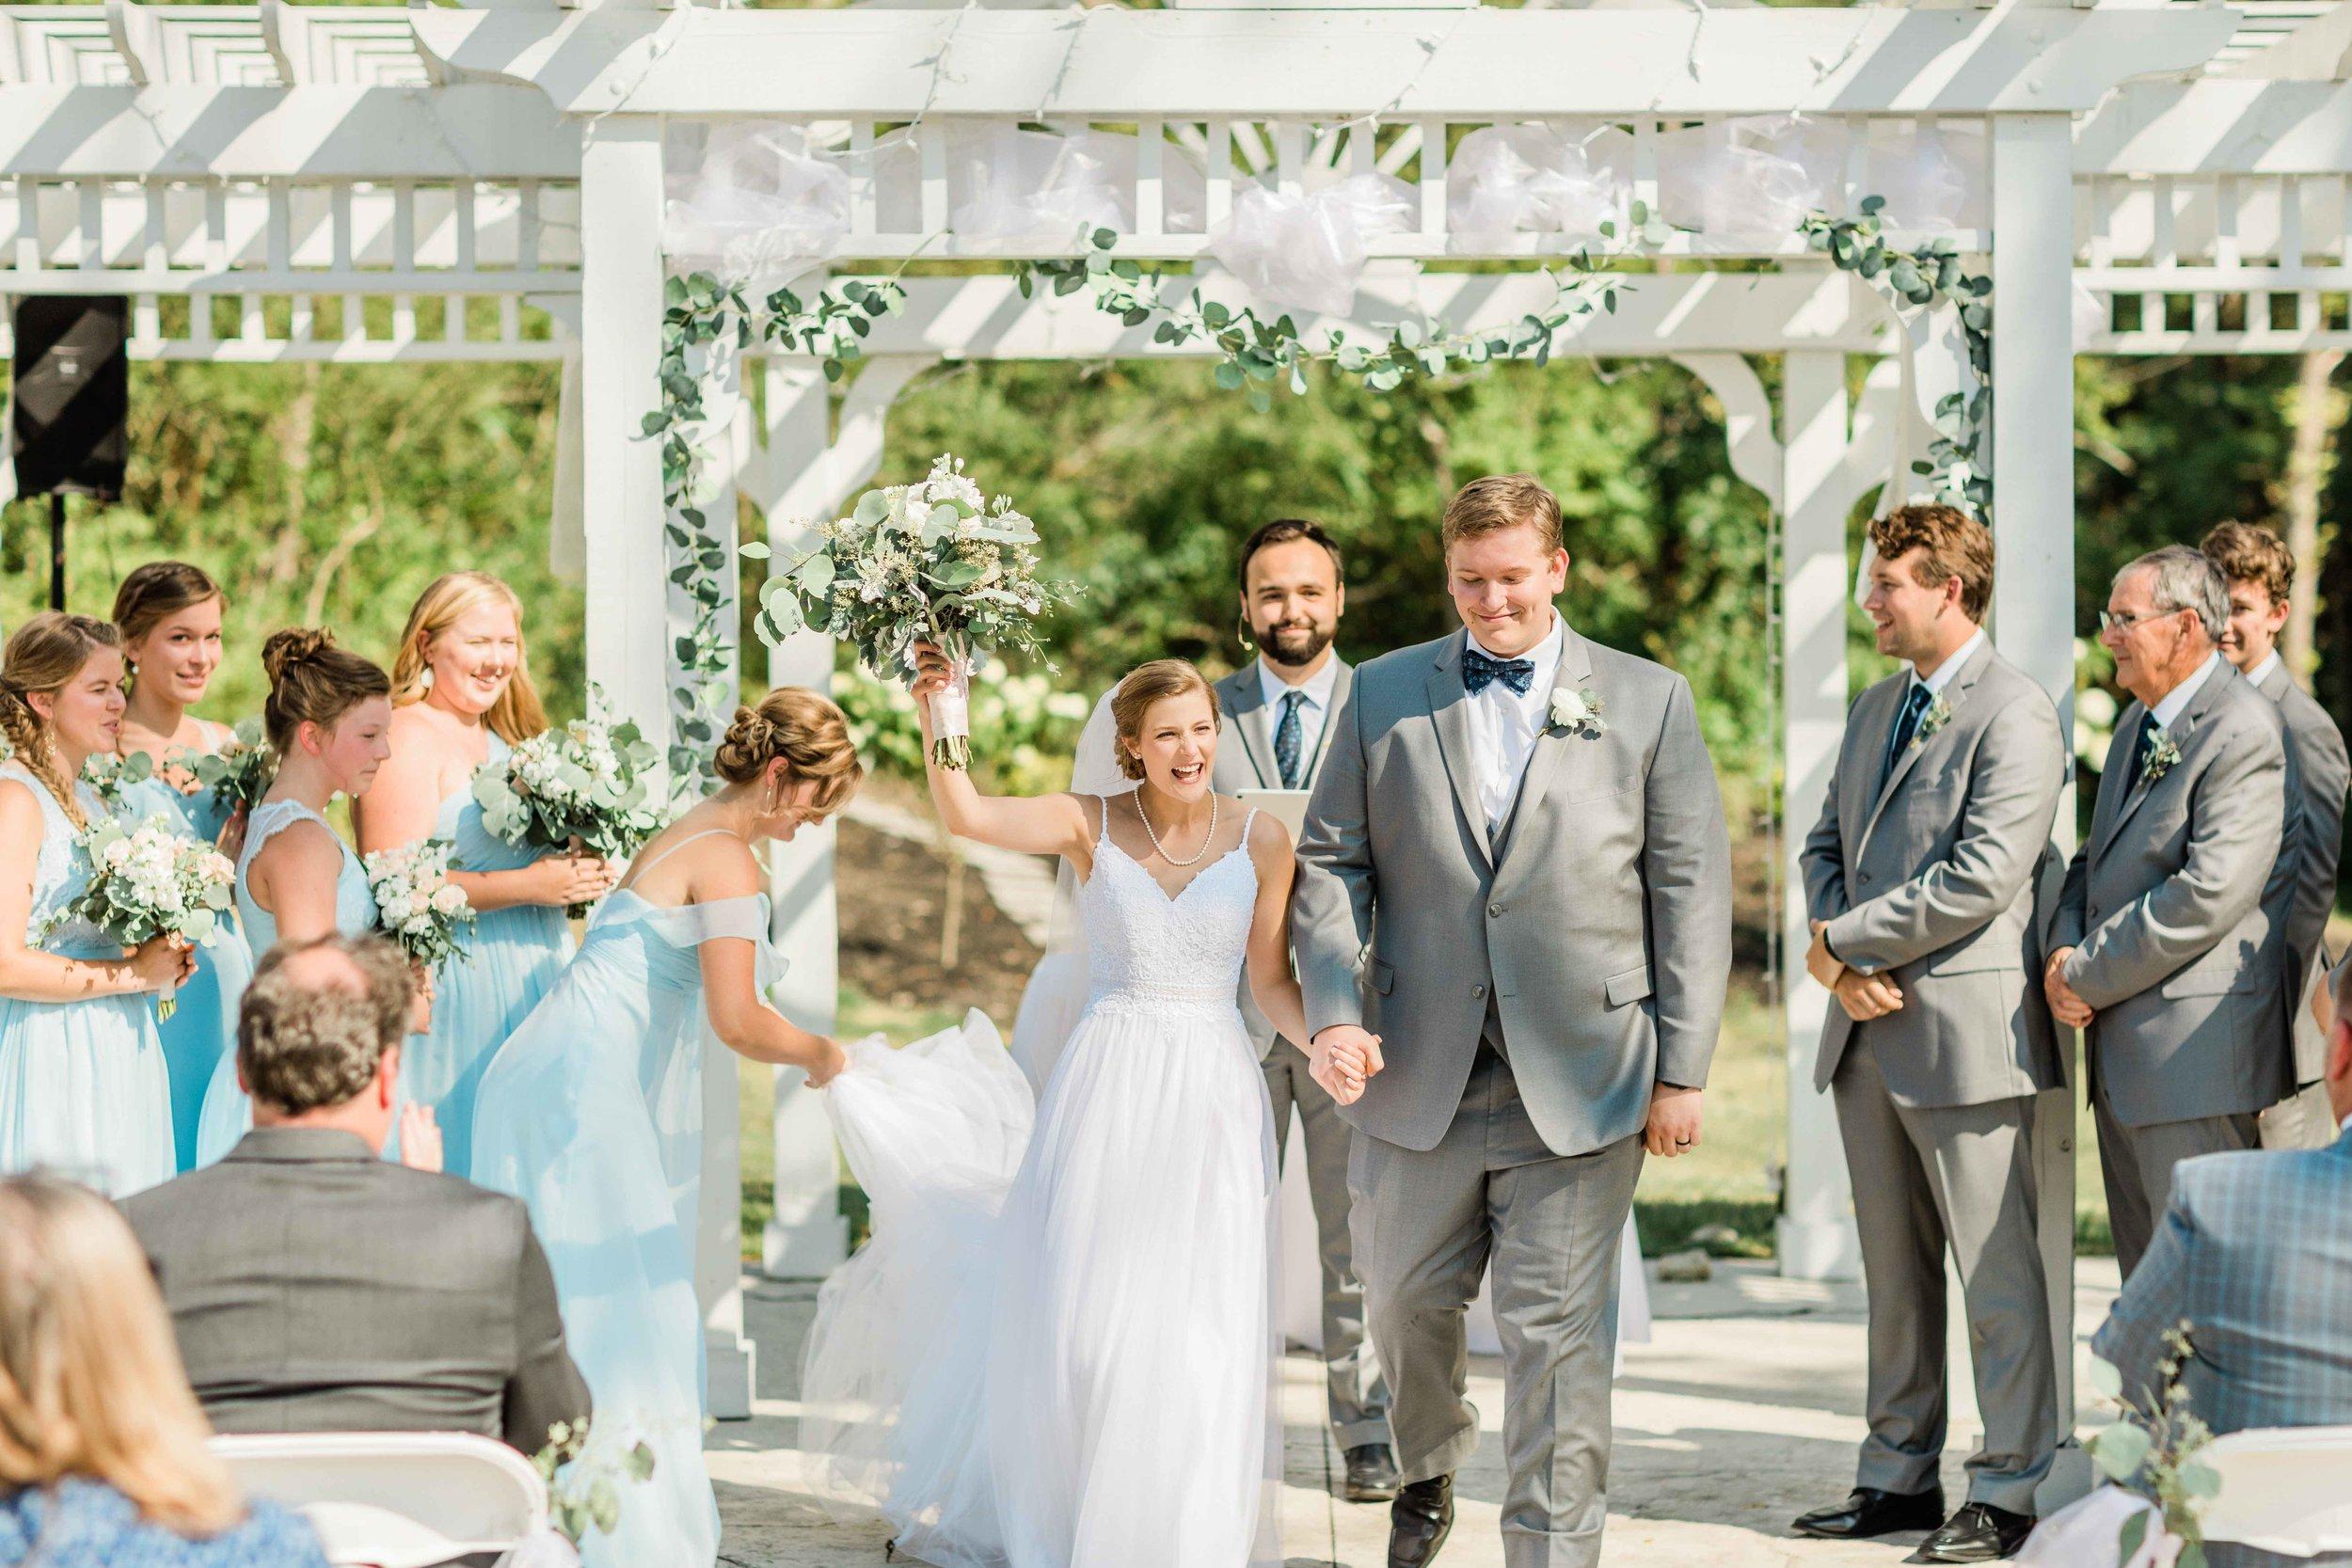 rosewood manor ohio wedding photographer-2.jpg